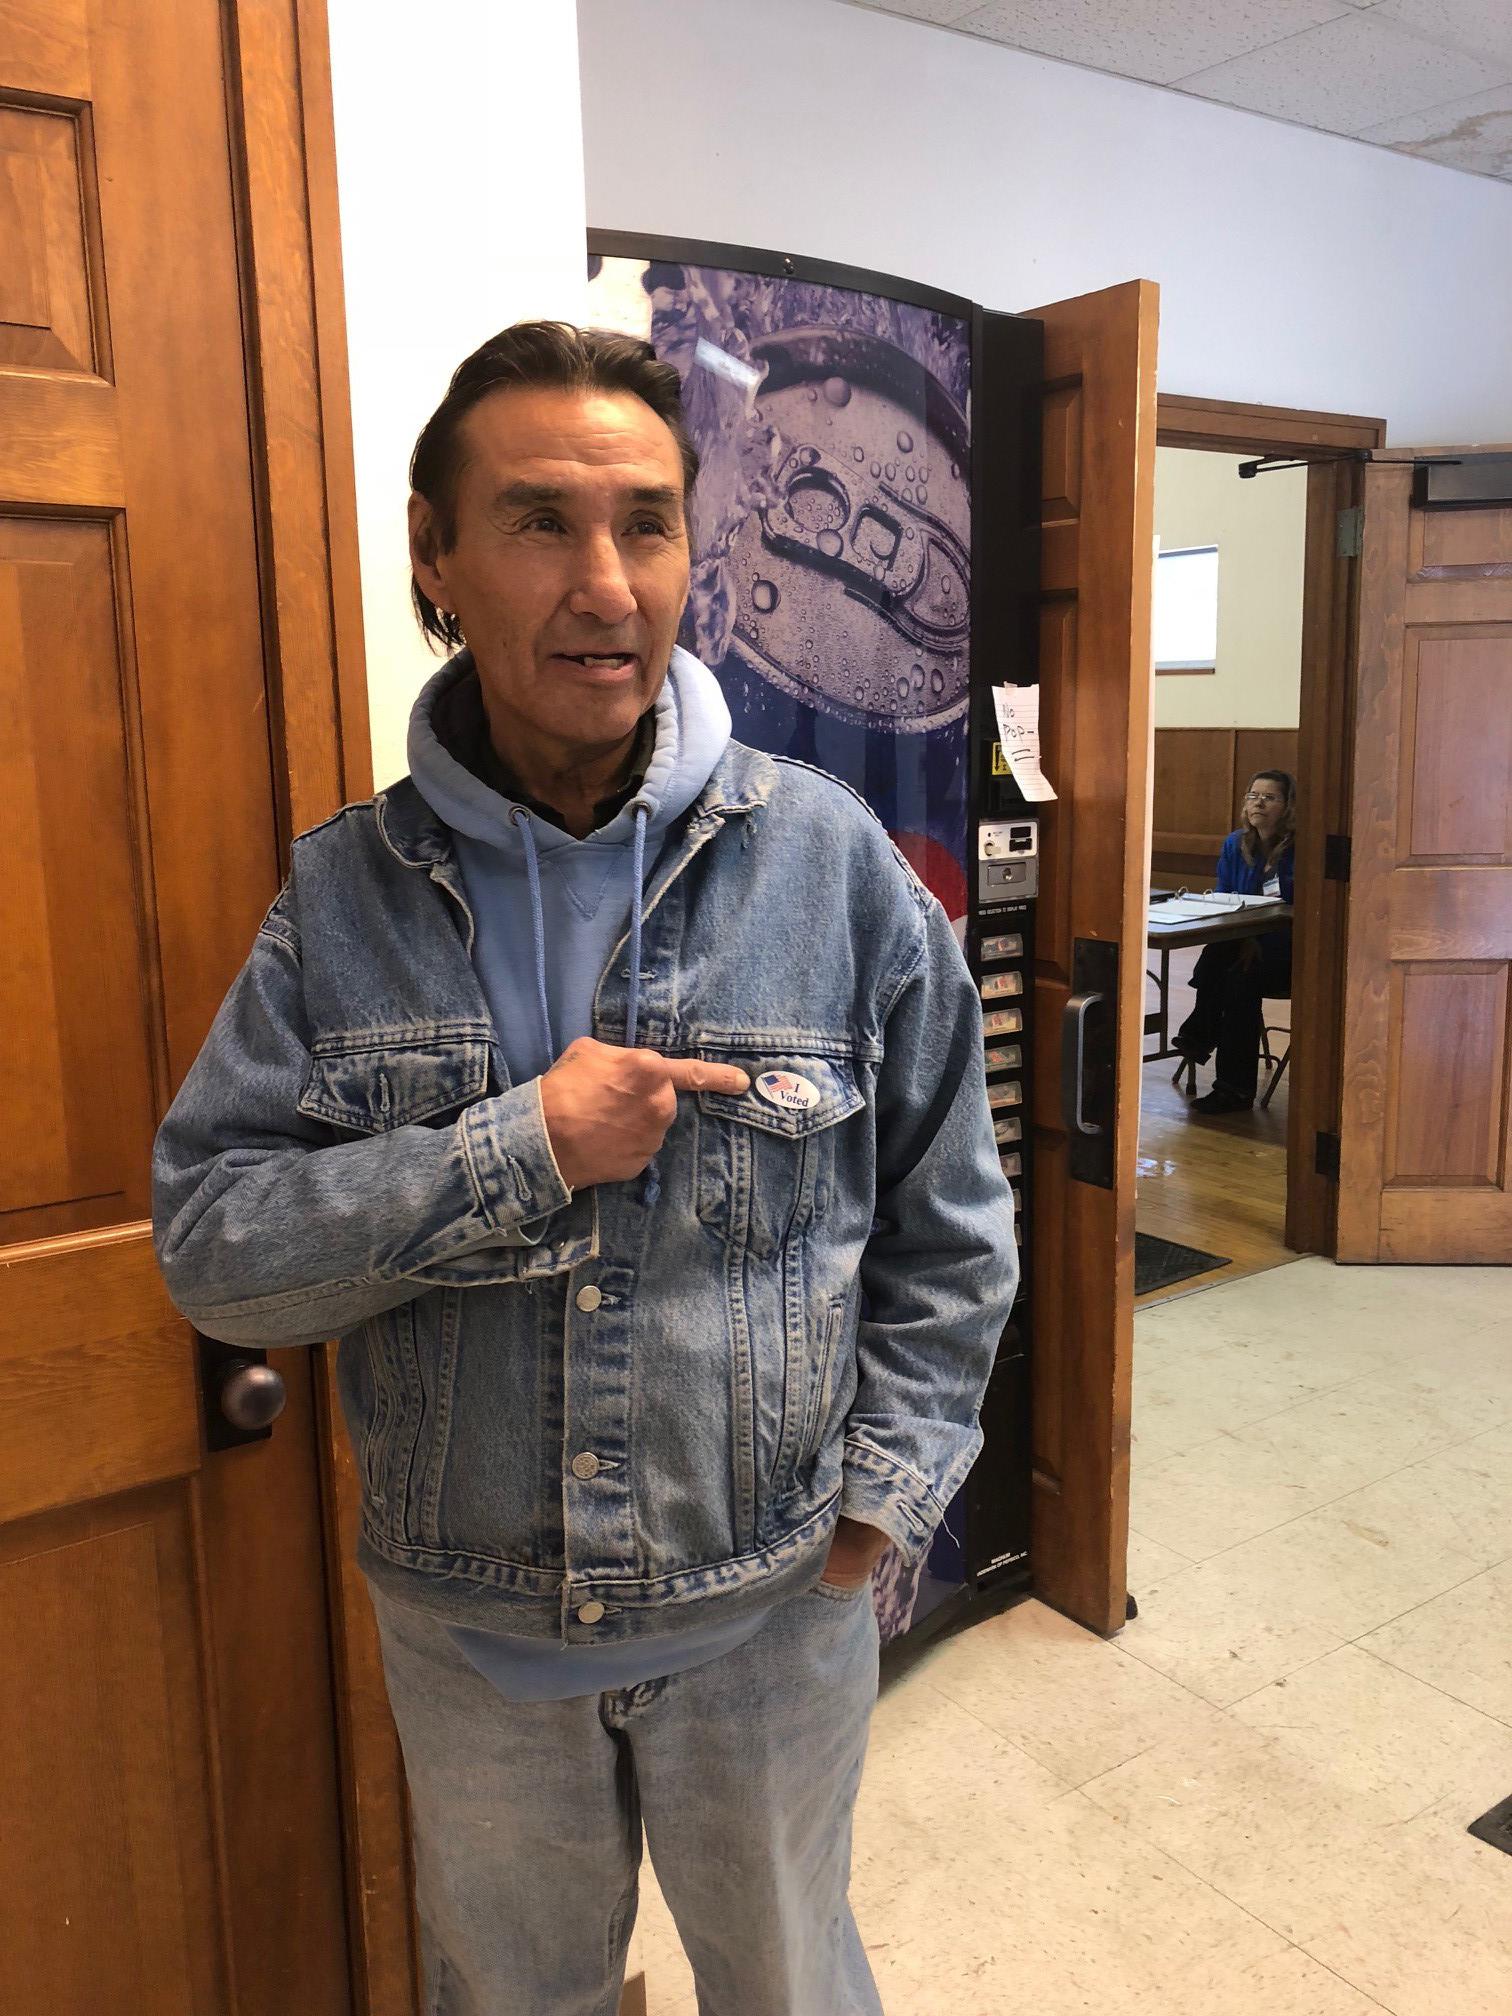 North Dakota voter ID law